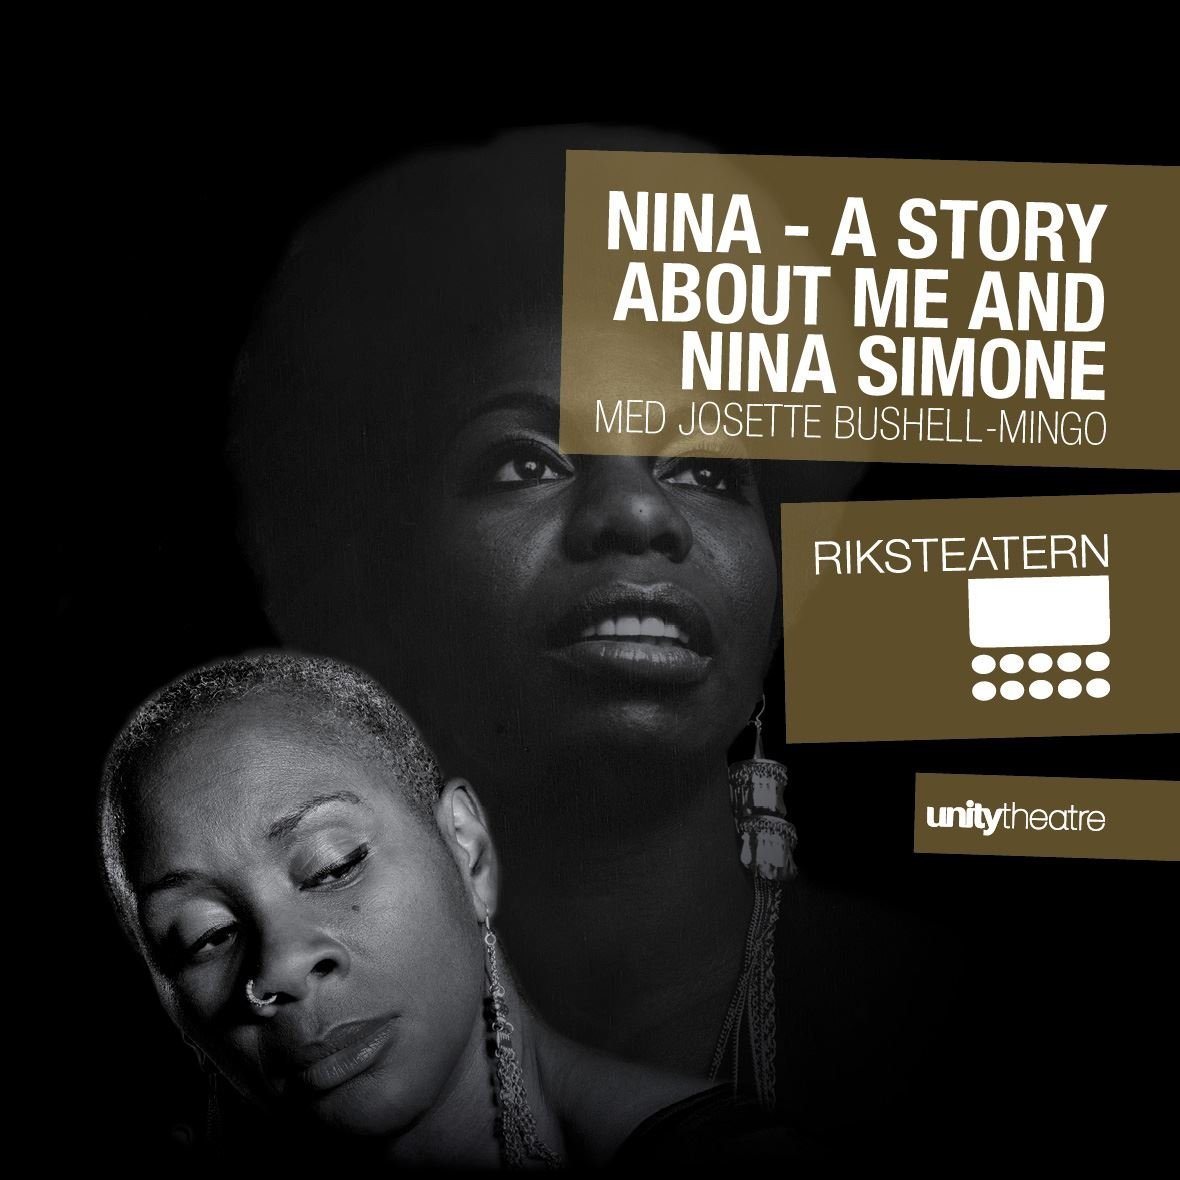 Nina - A story about me and Nina Simone